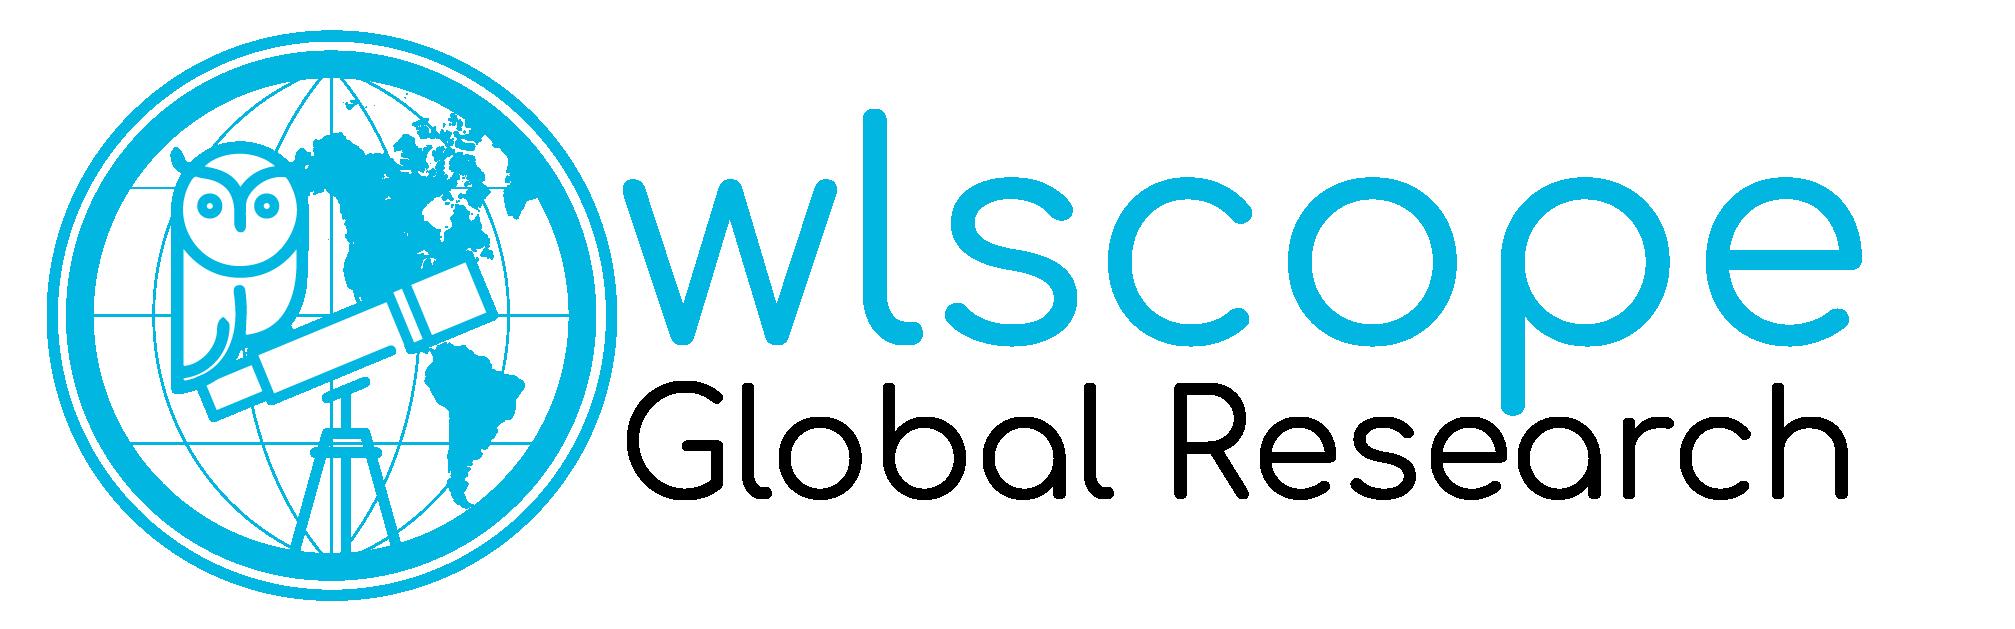 Owlscope Global Research